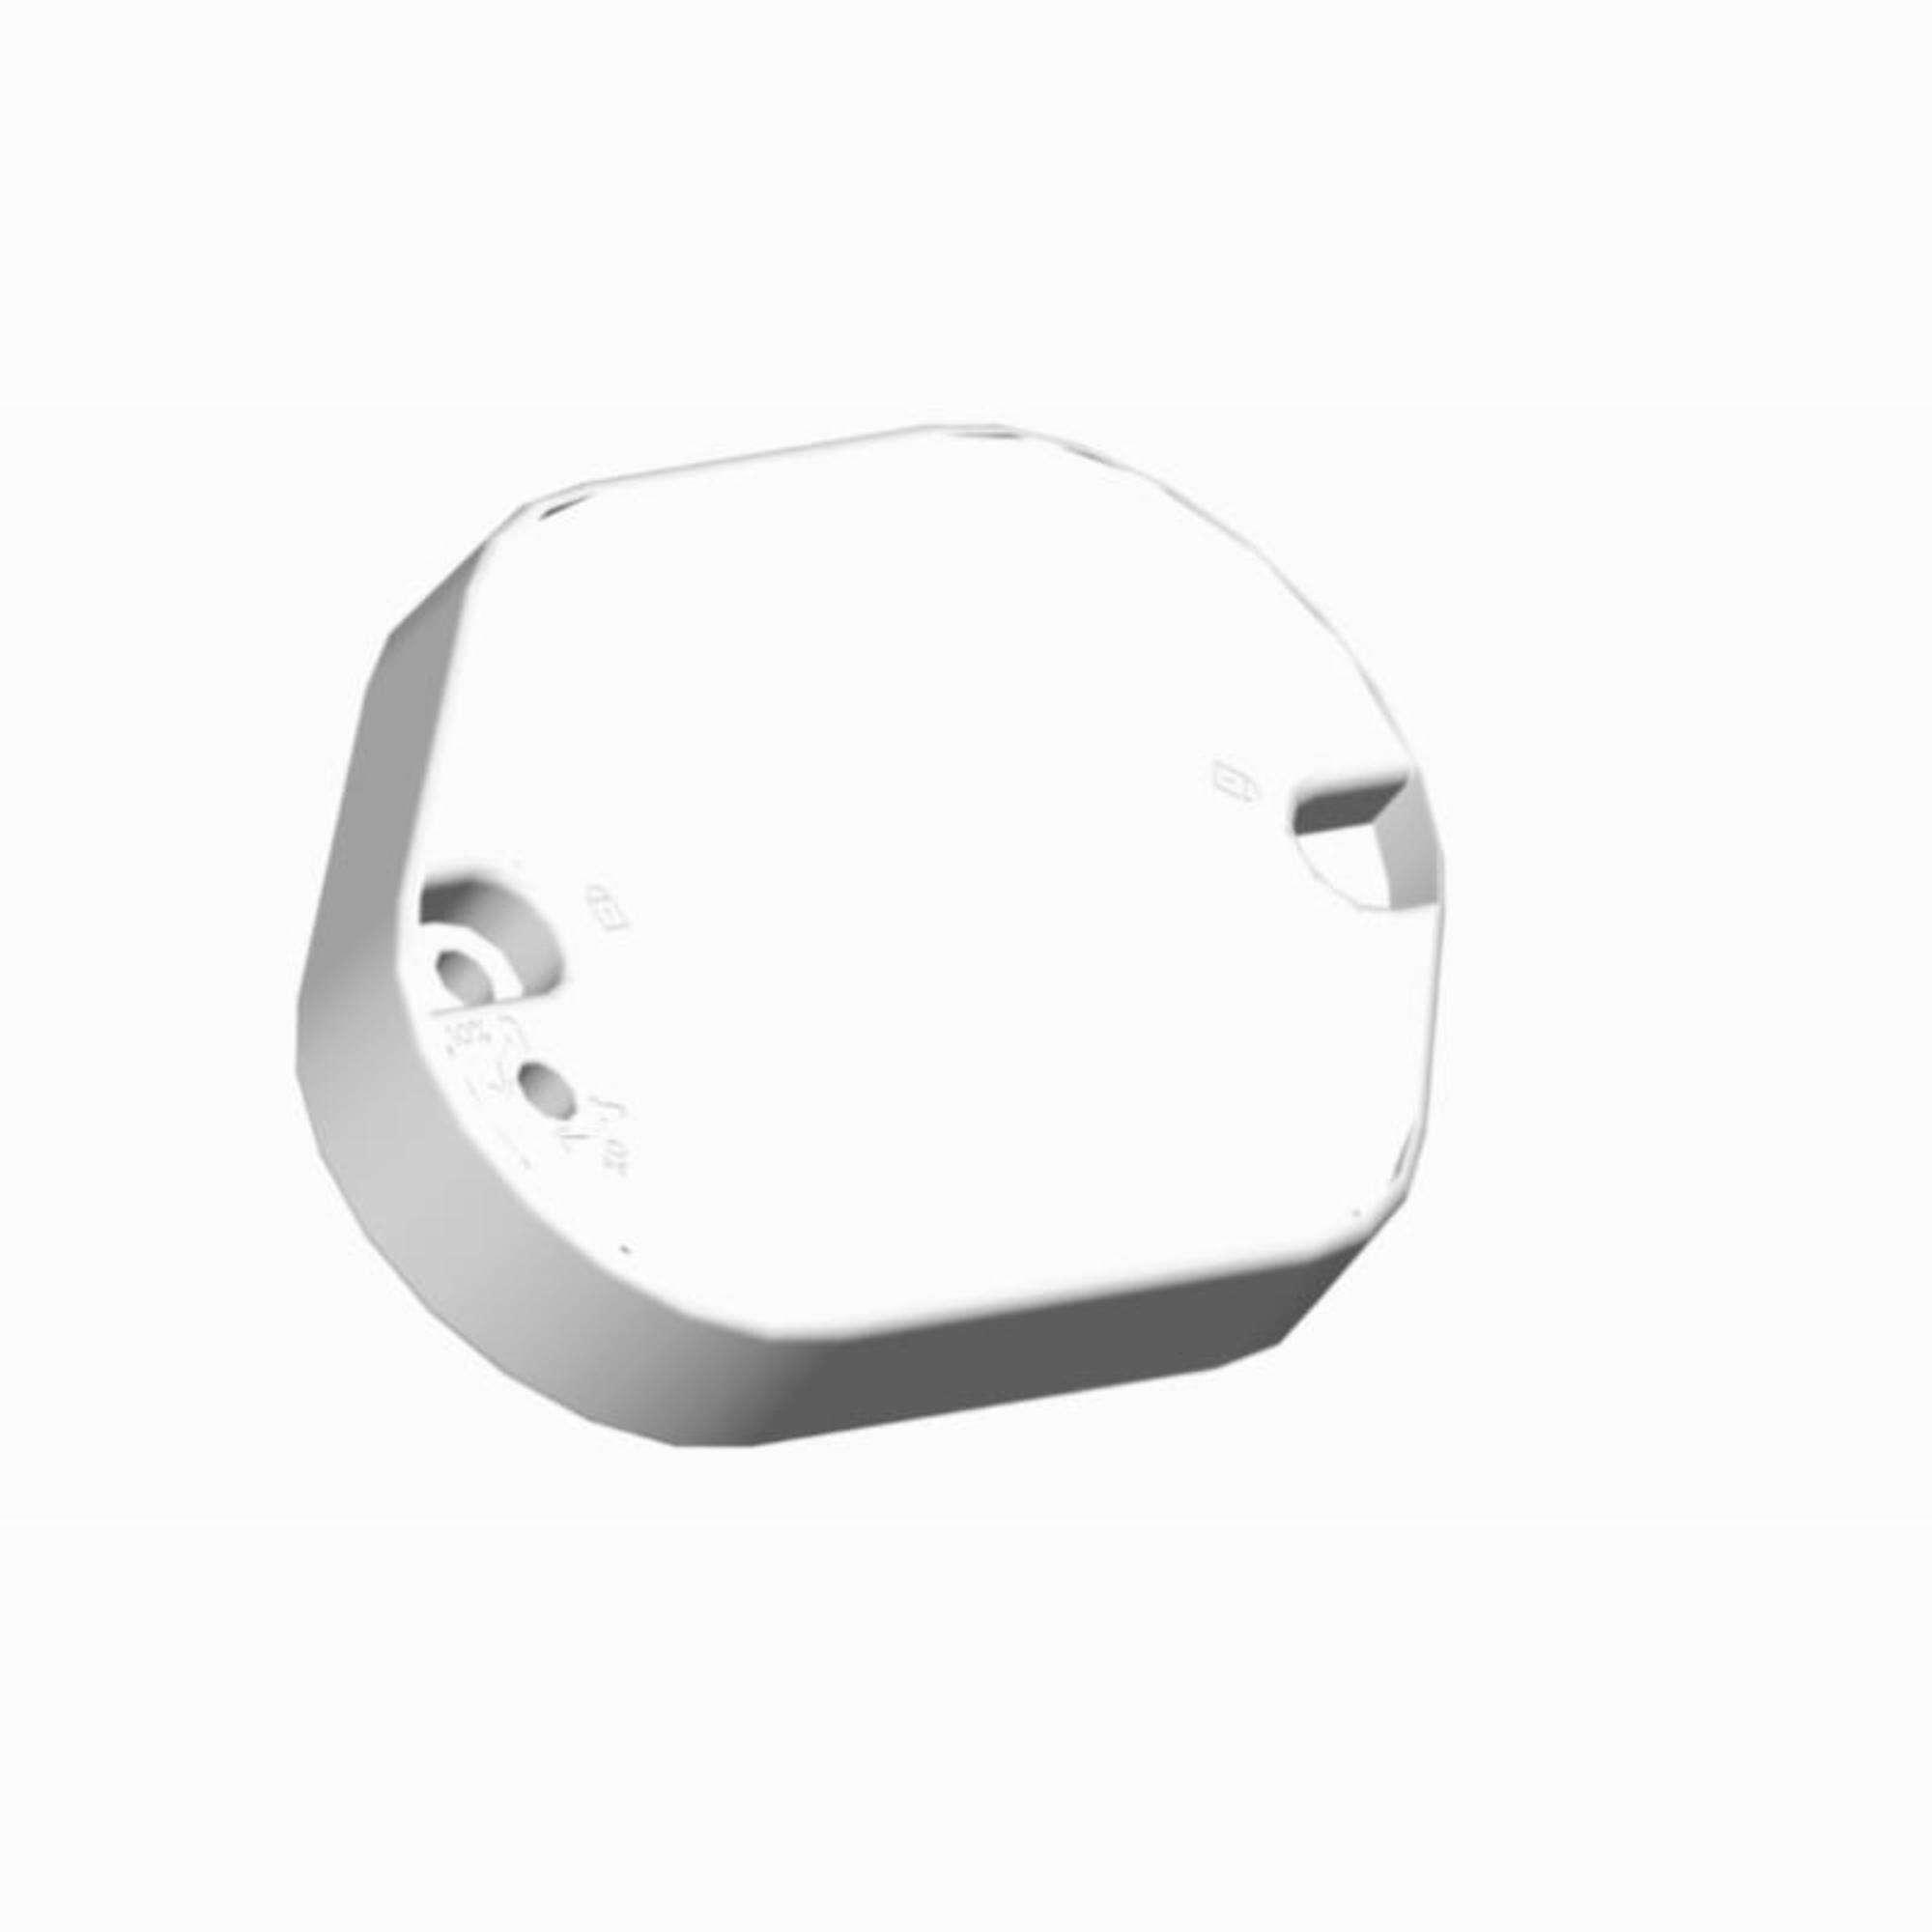 PLASTIC TREADMILL Fitness and Gym - Right hand elevation mechanism DOMYOS - Gym Equipment Repair